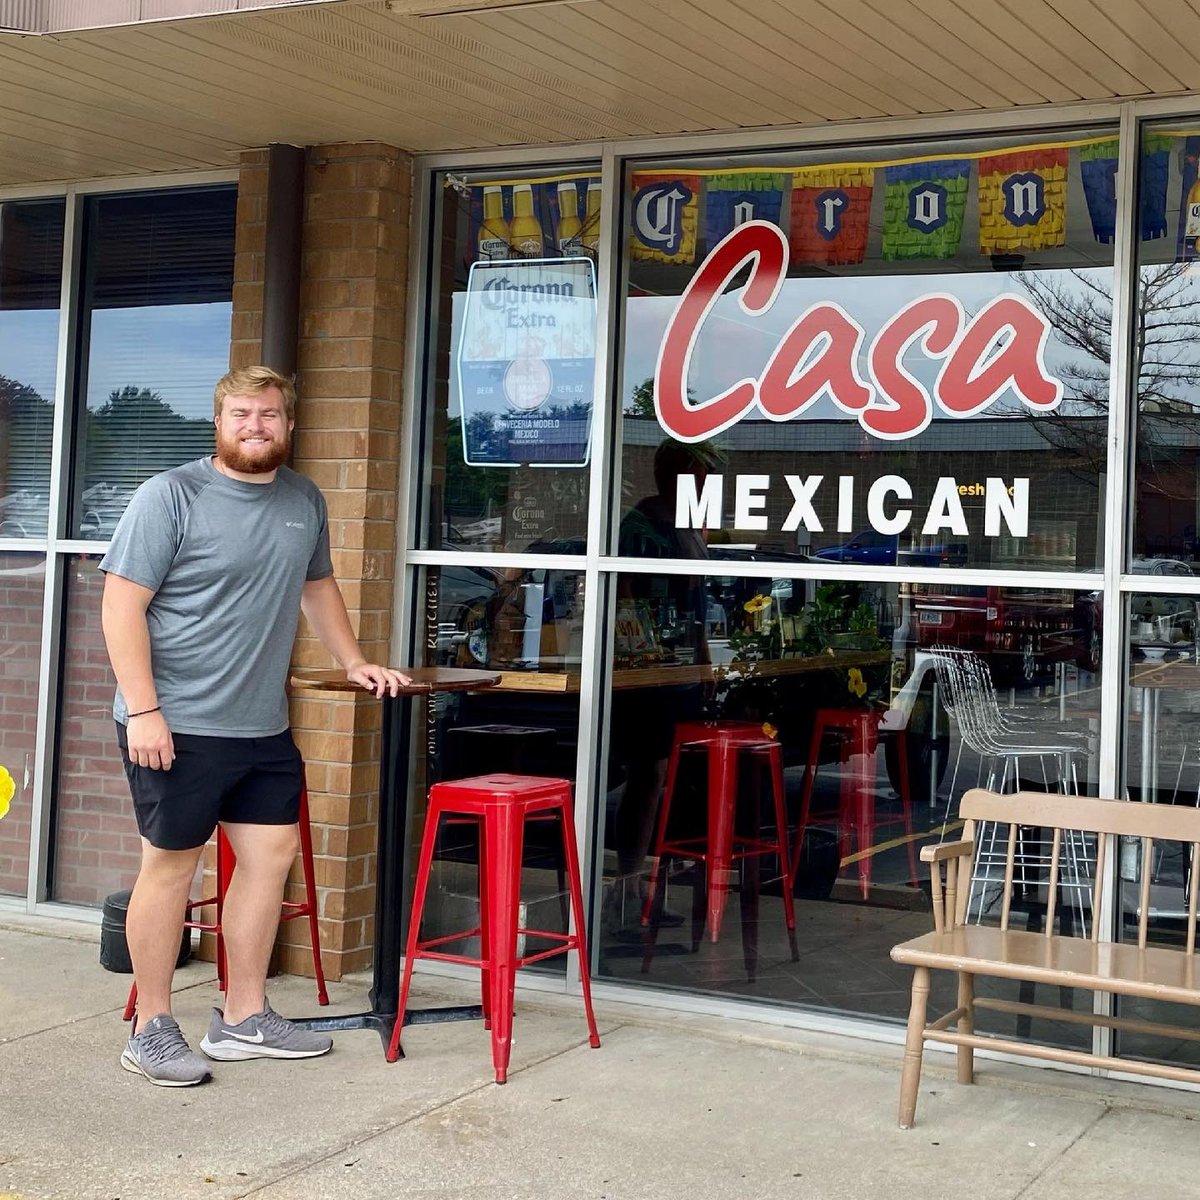 Drake Heismeyer On Twitter Best Street Tacos In Stl Hands Down 69eatslocal Benavidezdanny Casa Mia Mexican Kitchen